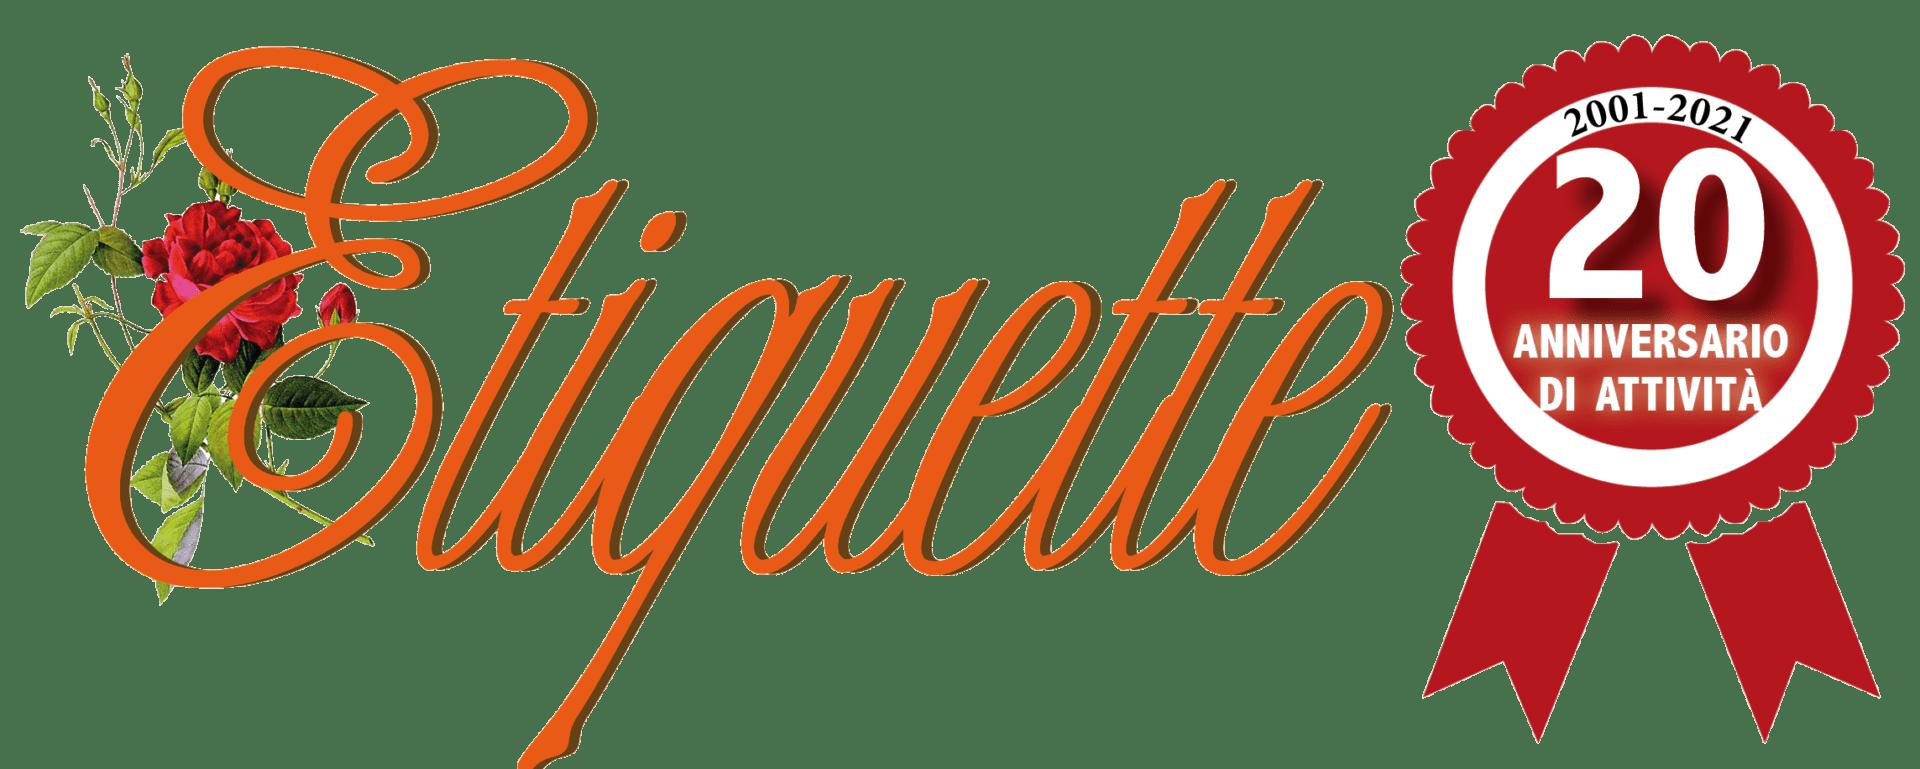 Etiquette Academy Italy